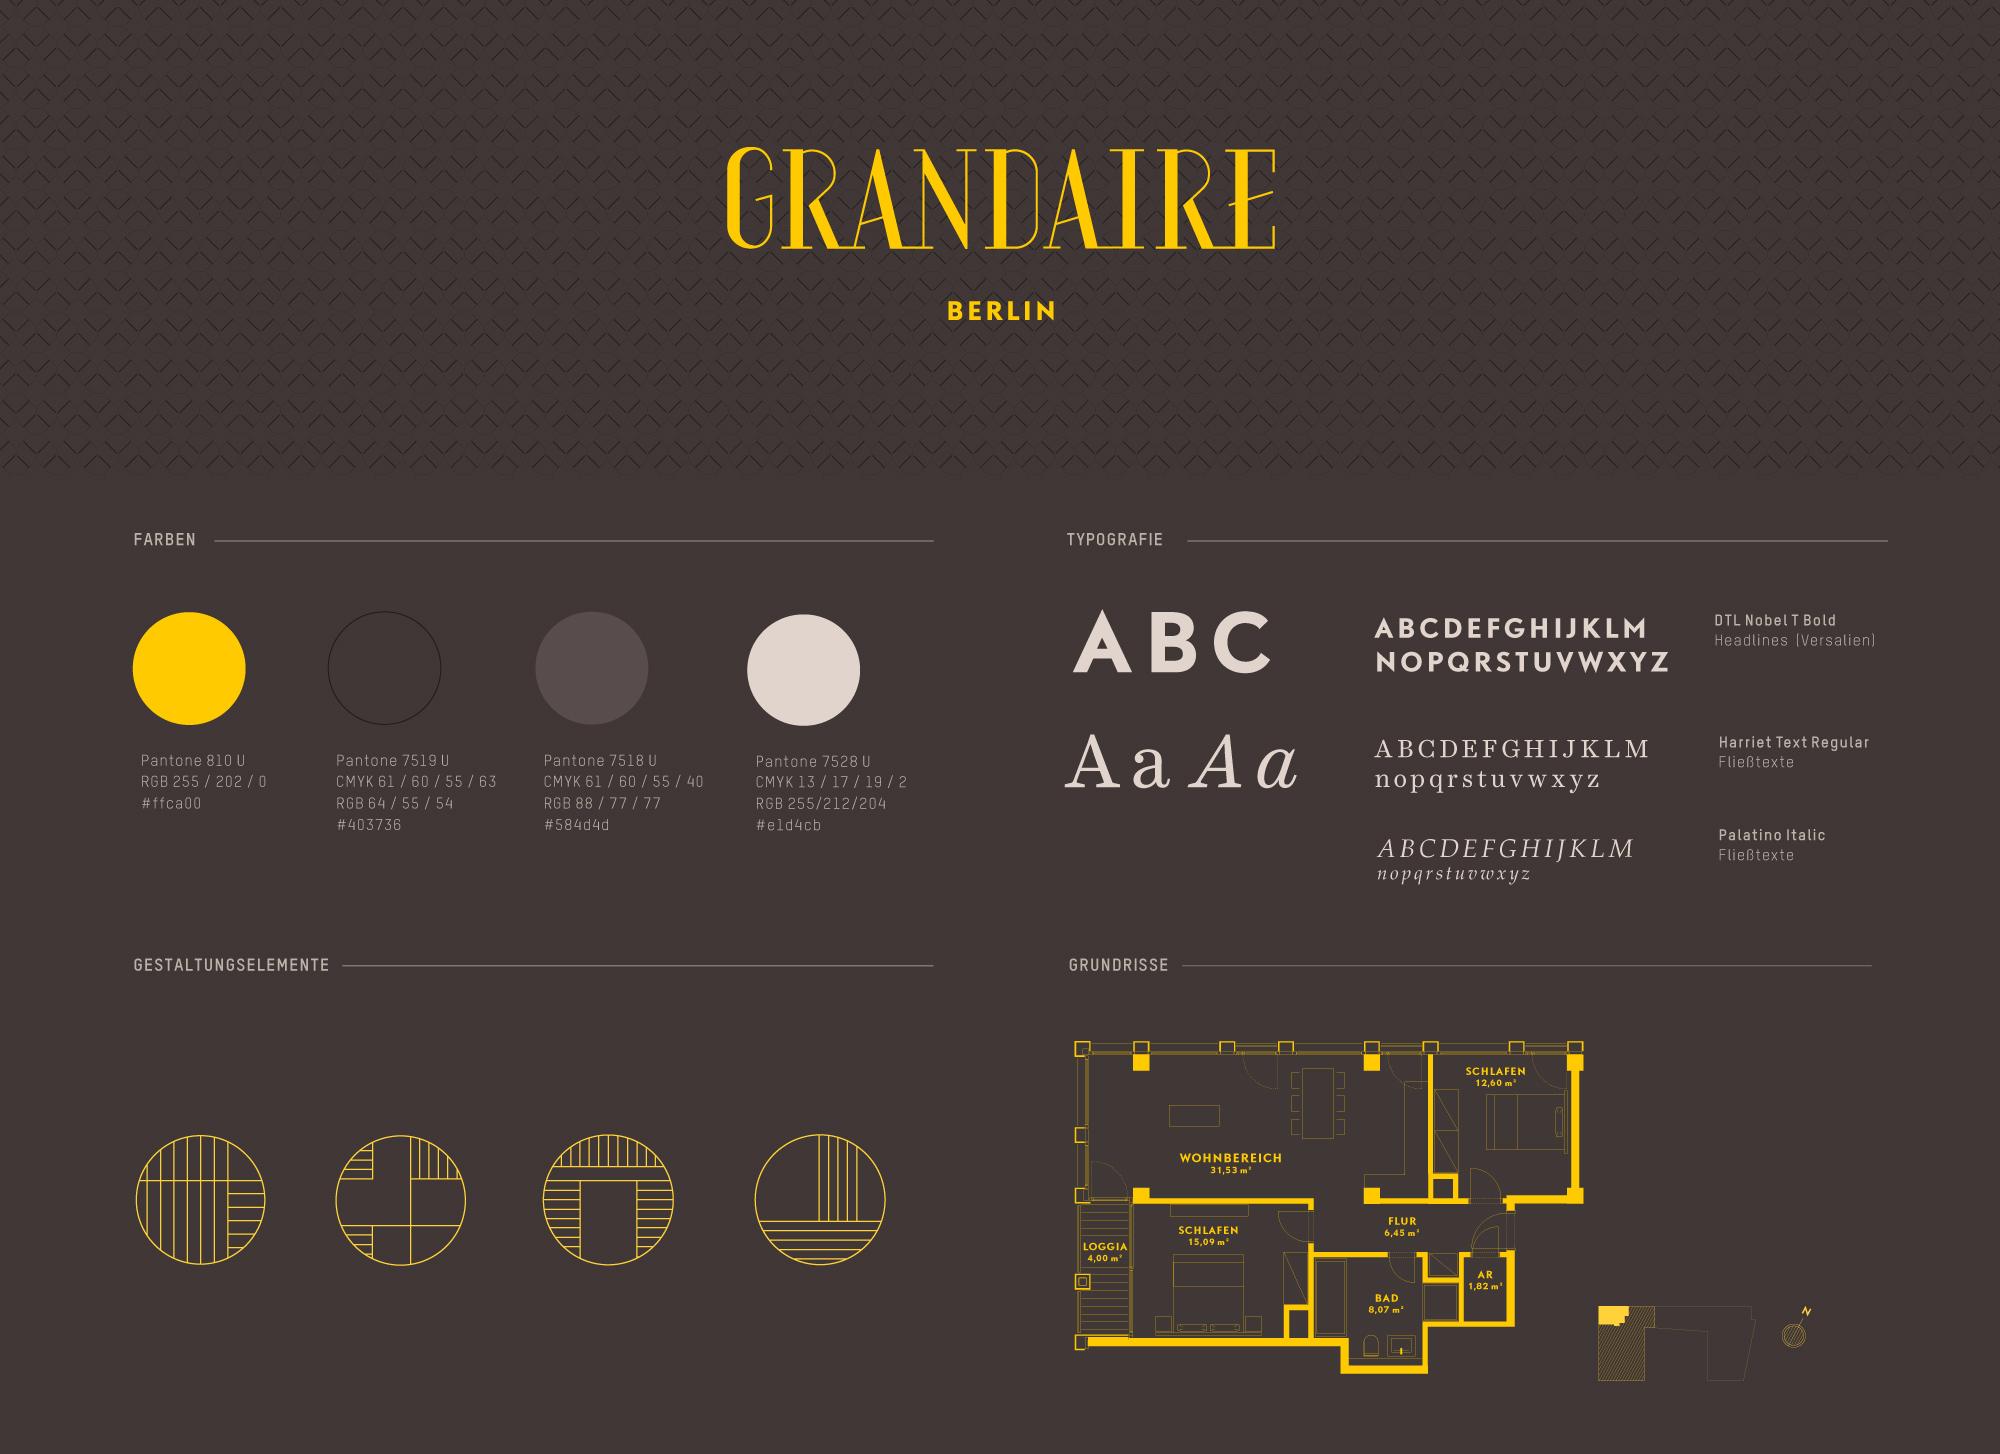 190719_Grandaire_Webseite_CD_Elemente_web_neu